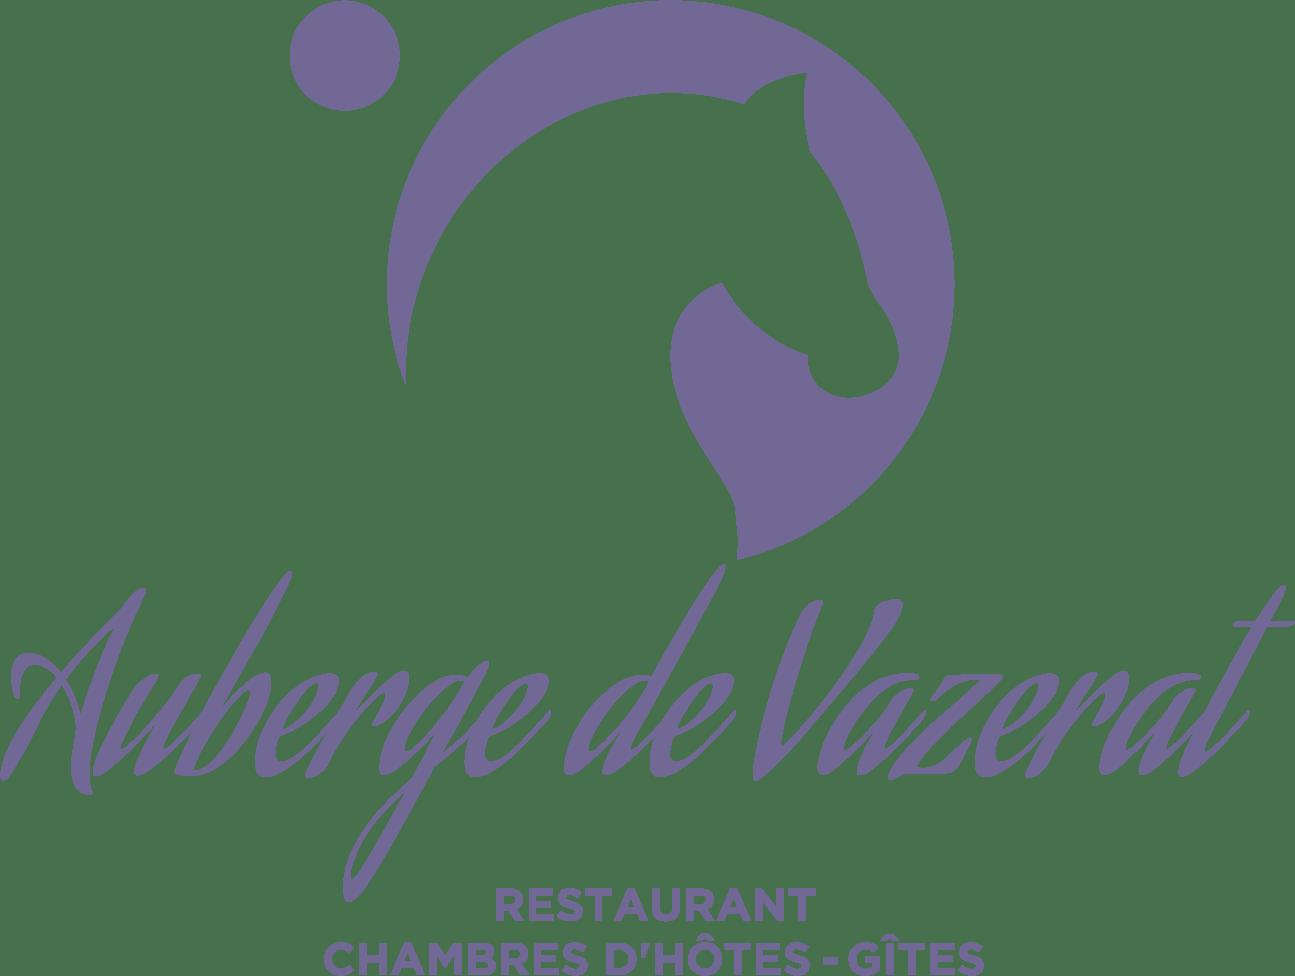 Auberge de Vazerat